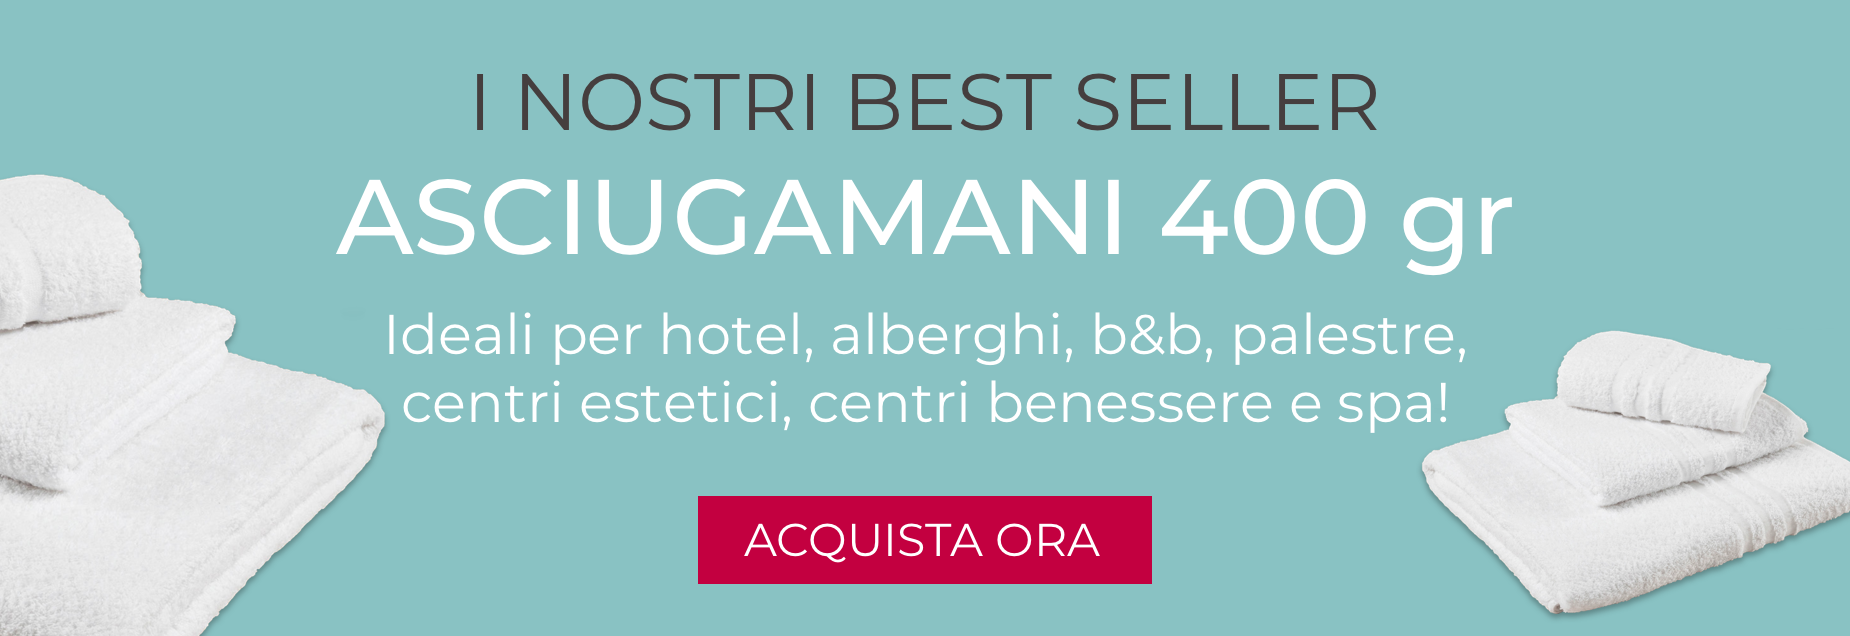 Best Seller - Asciugamani 400 gr